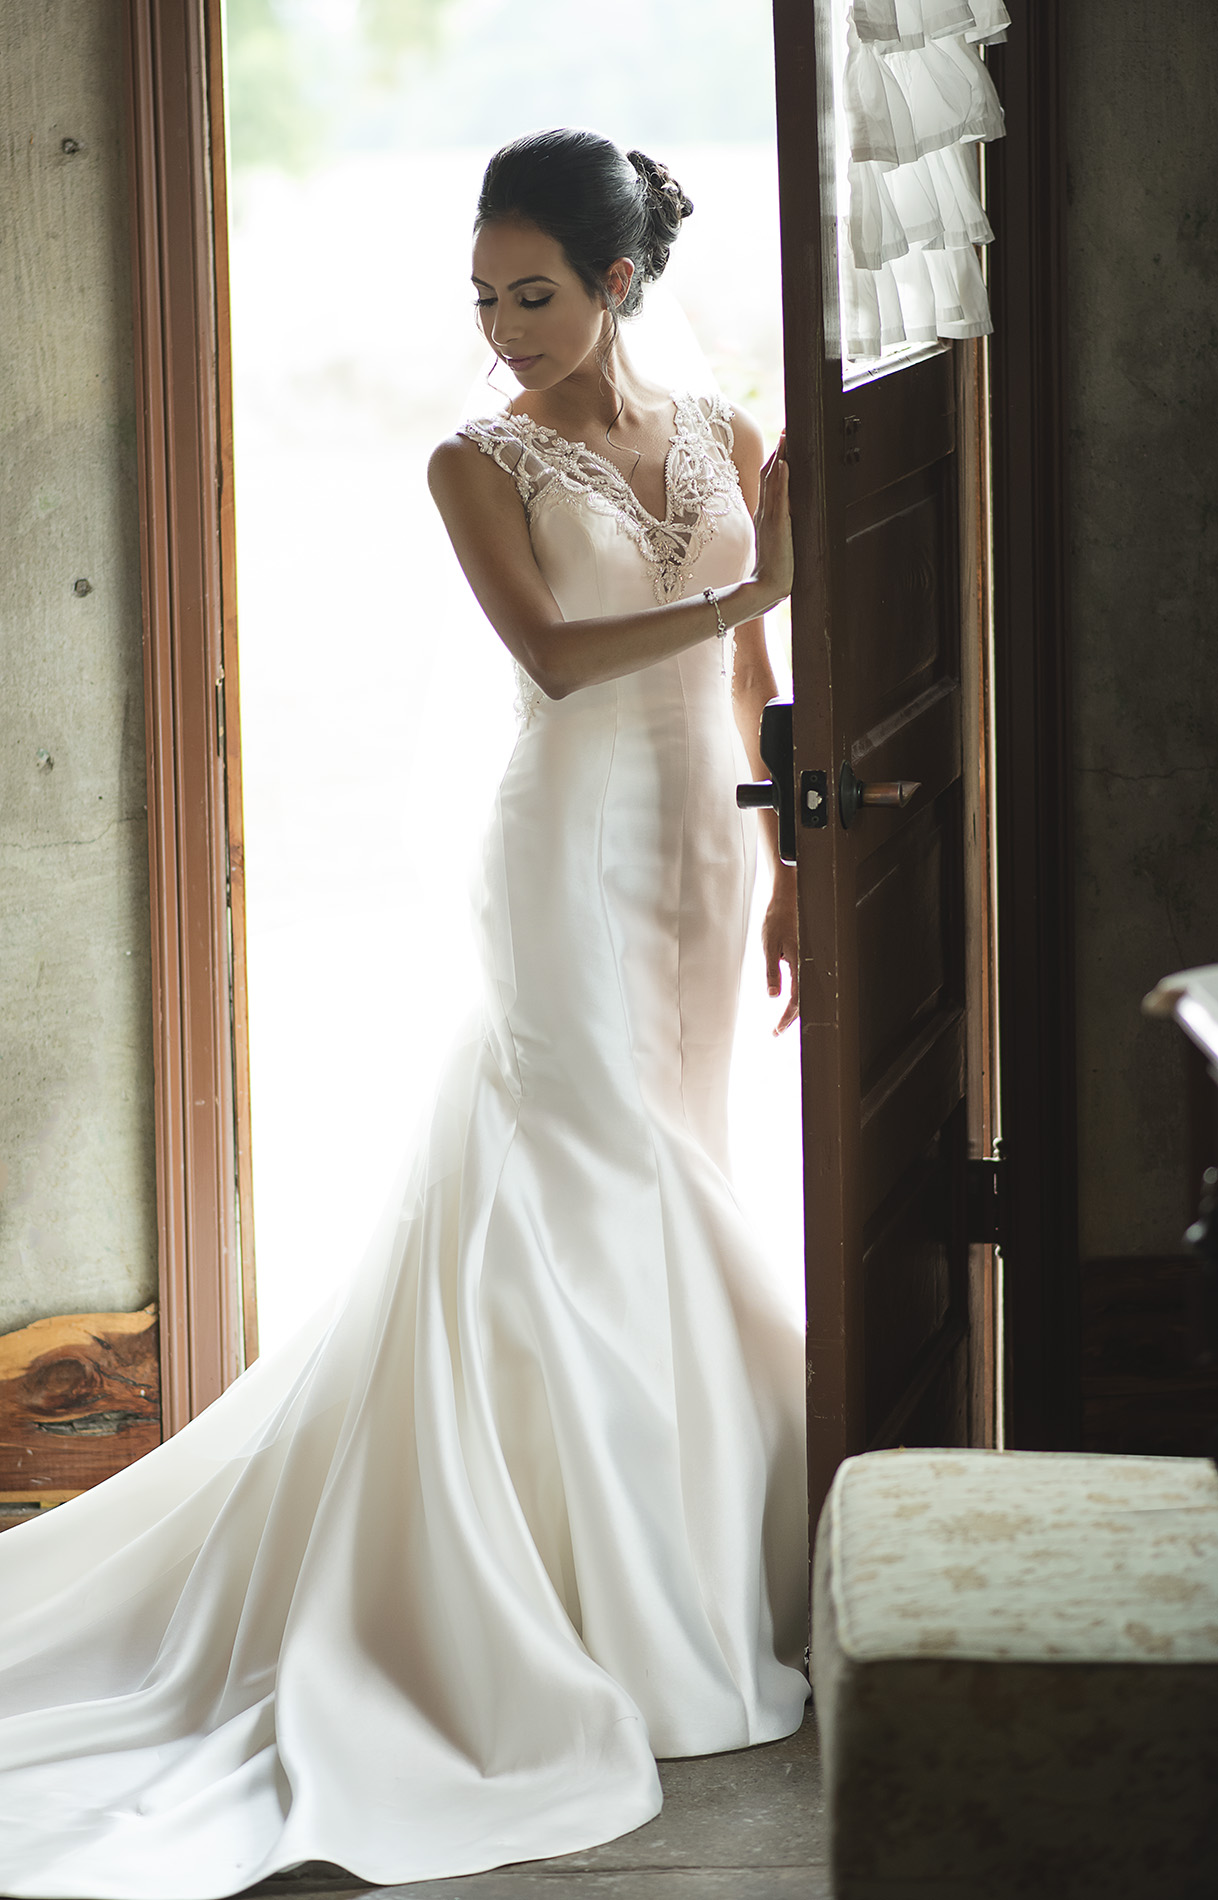 Houston-venue-Olde-Dobbin-Station-Romantic-Classic-Wedding-Photographer-036.jpg